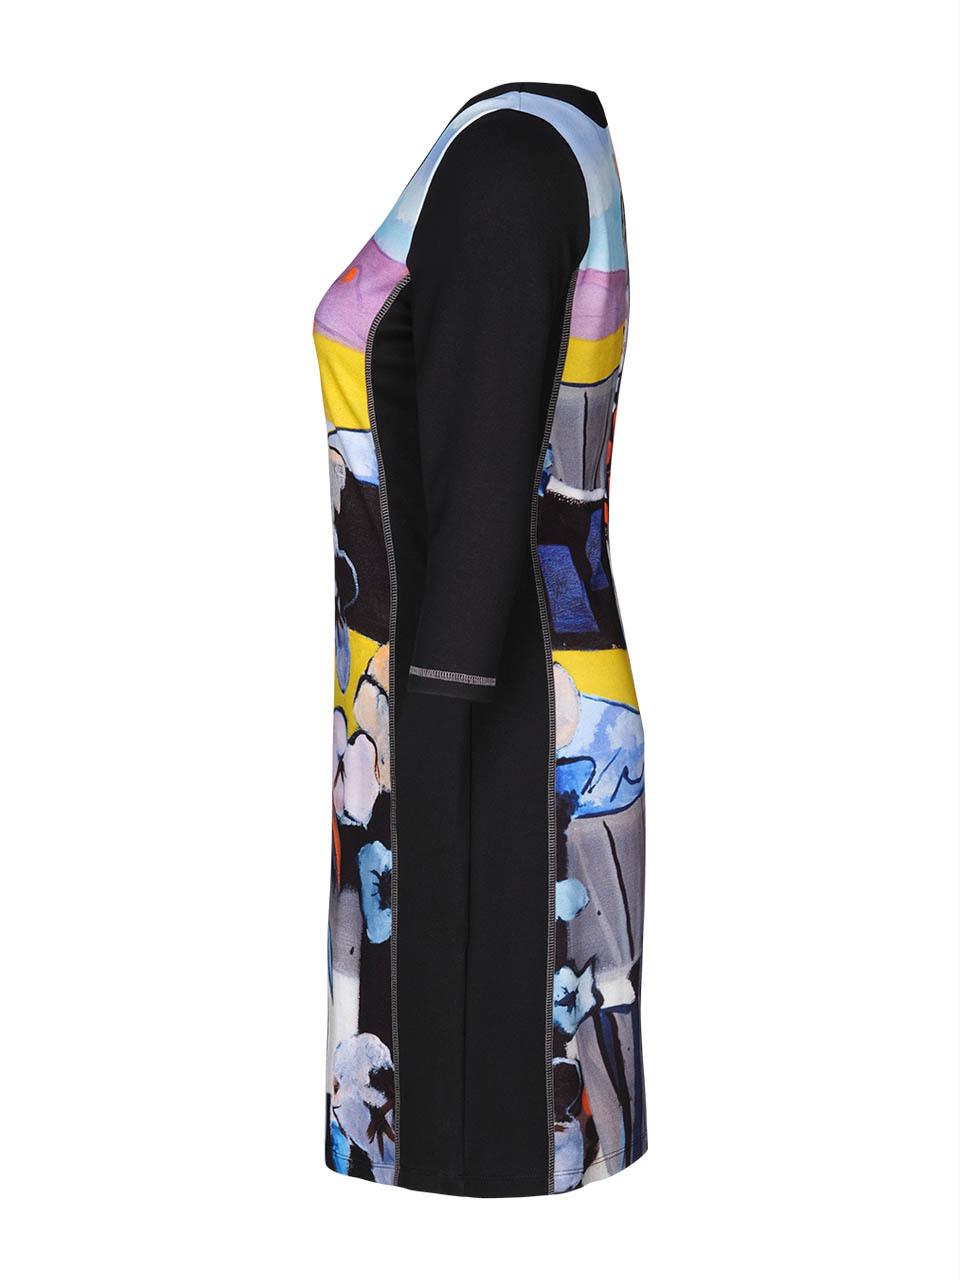 Simply Art Dolcezza: Still Life Abstract Art Dress (Few Left!)